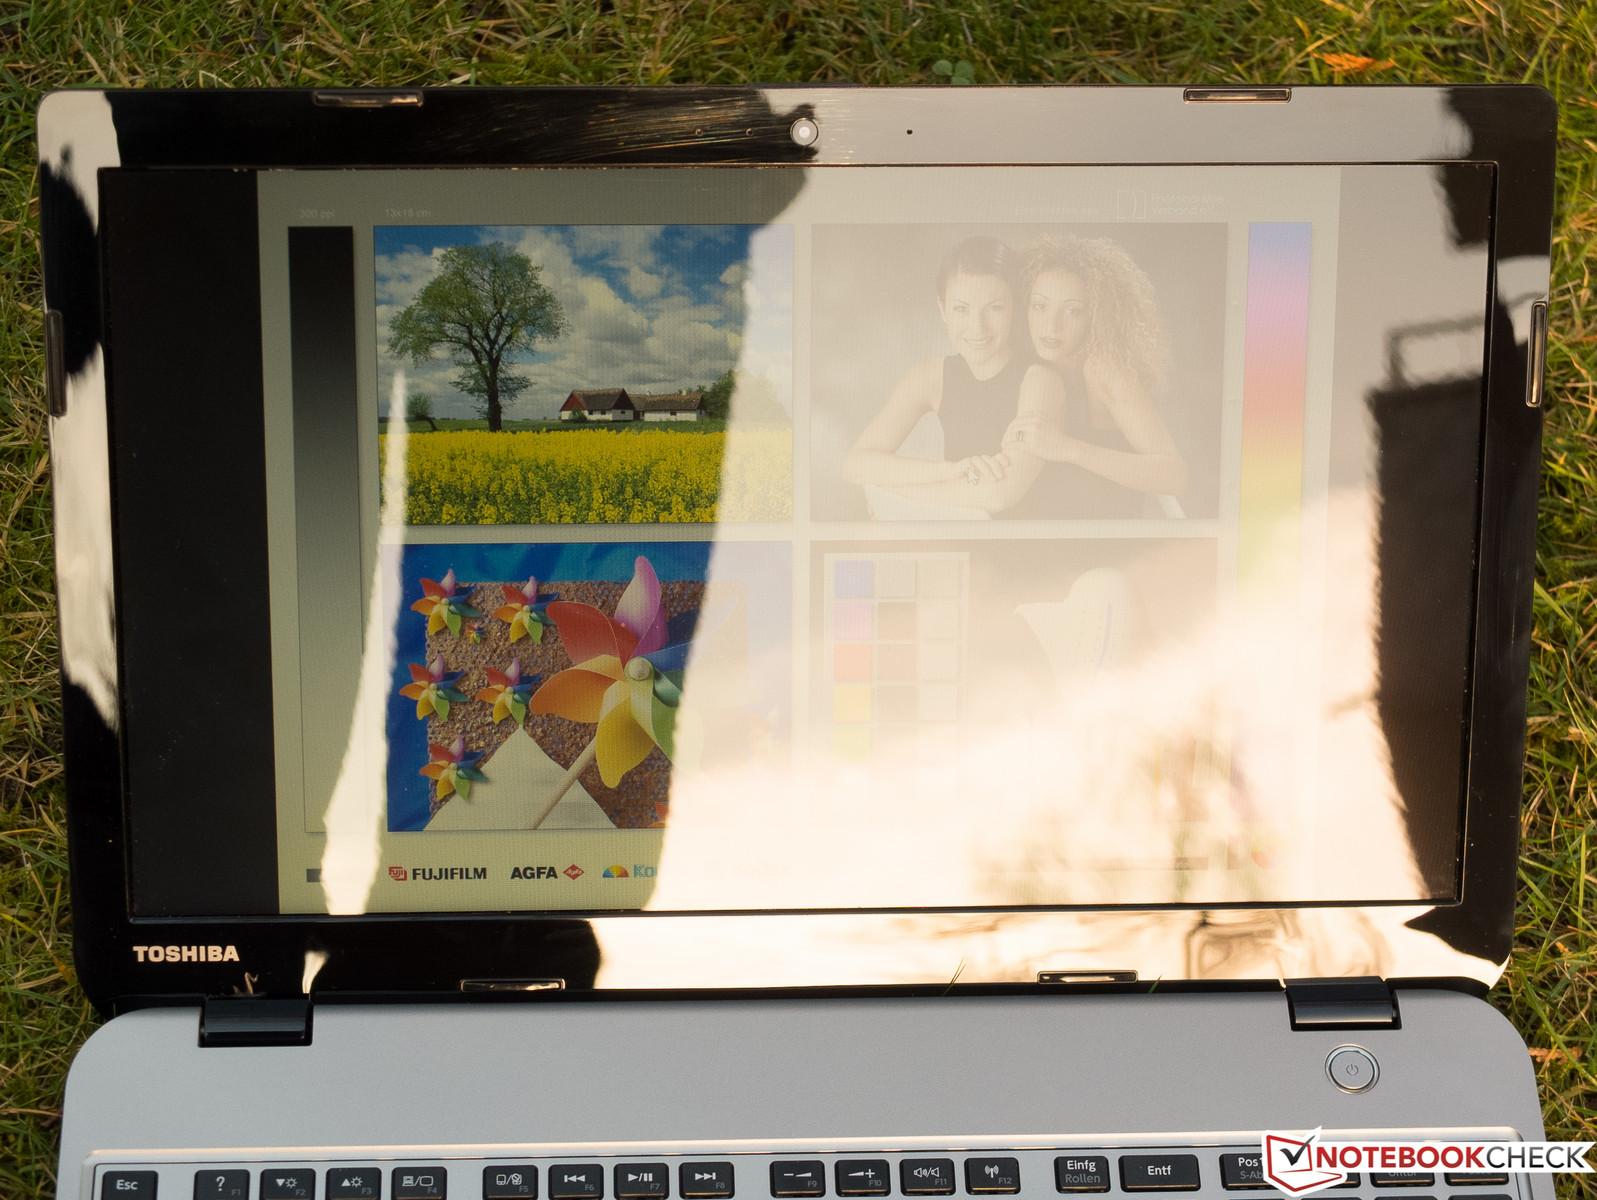 Toshiba Satellite M50 Infrared Drivers for Windows Mac